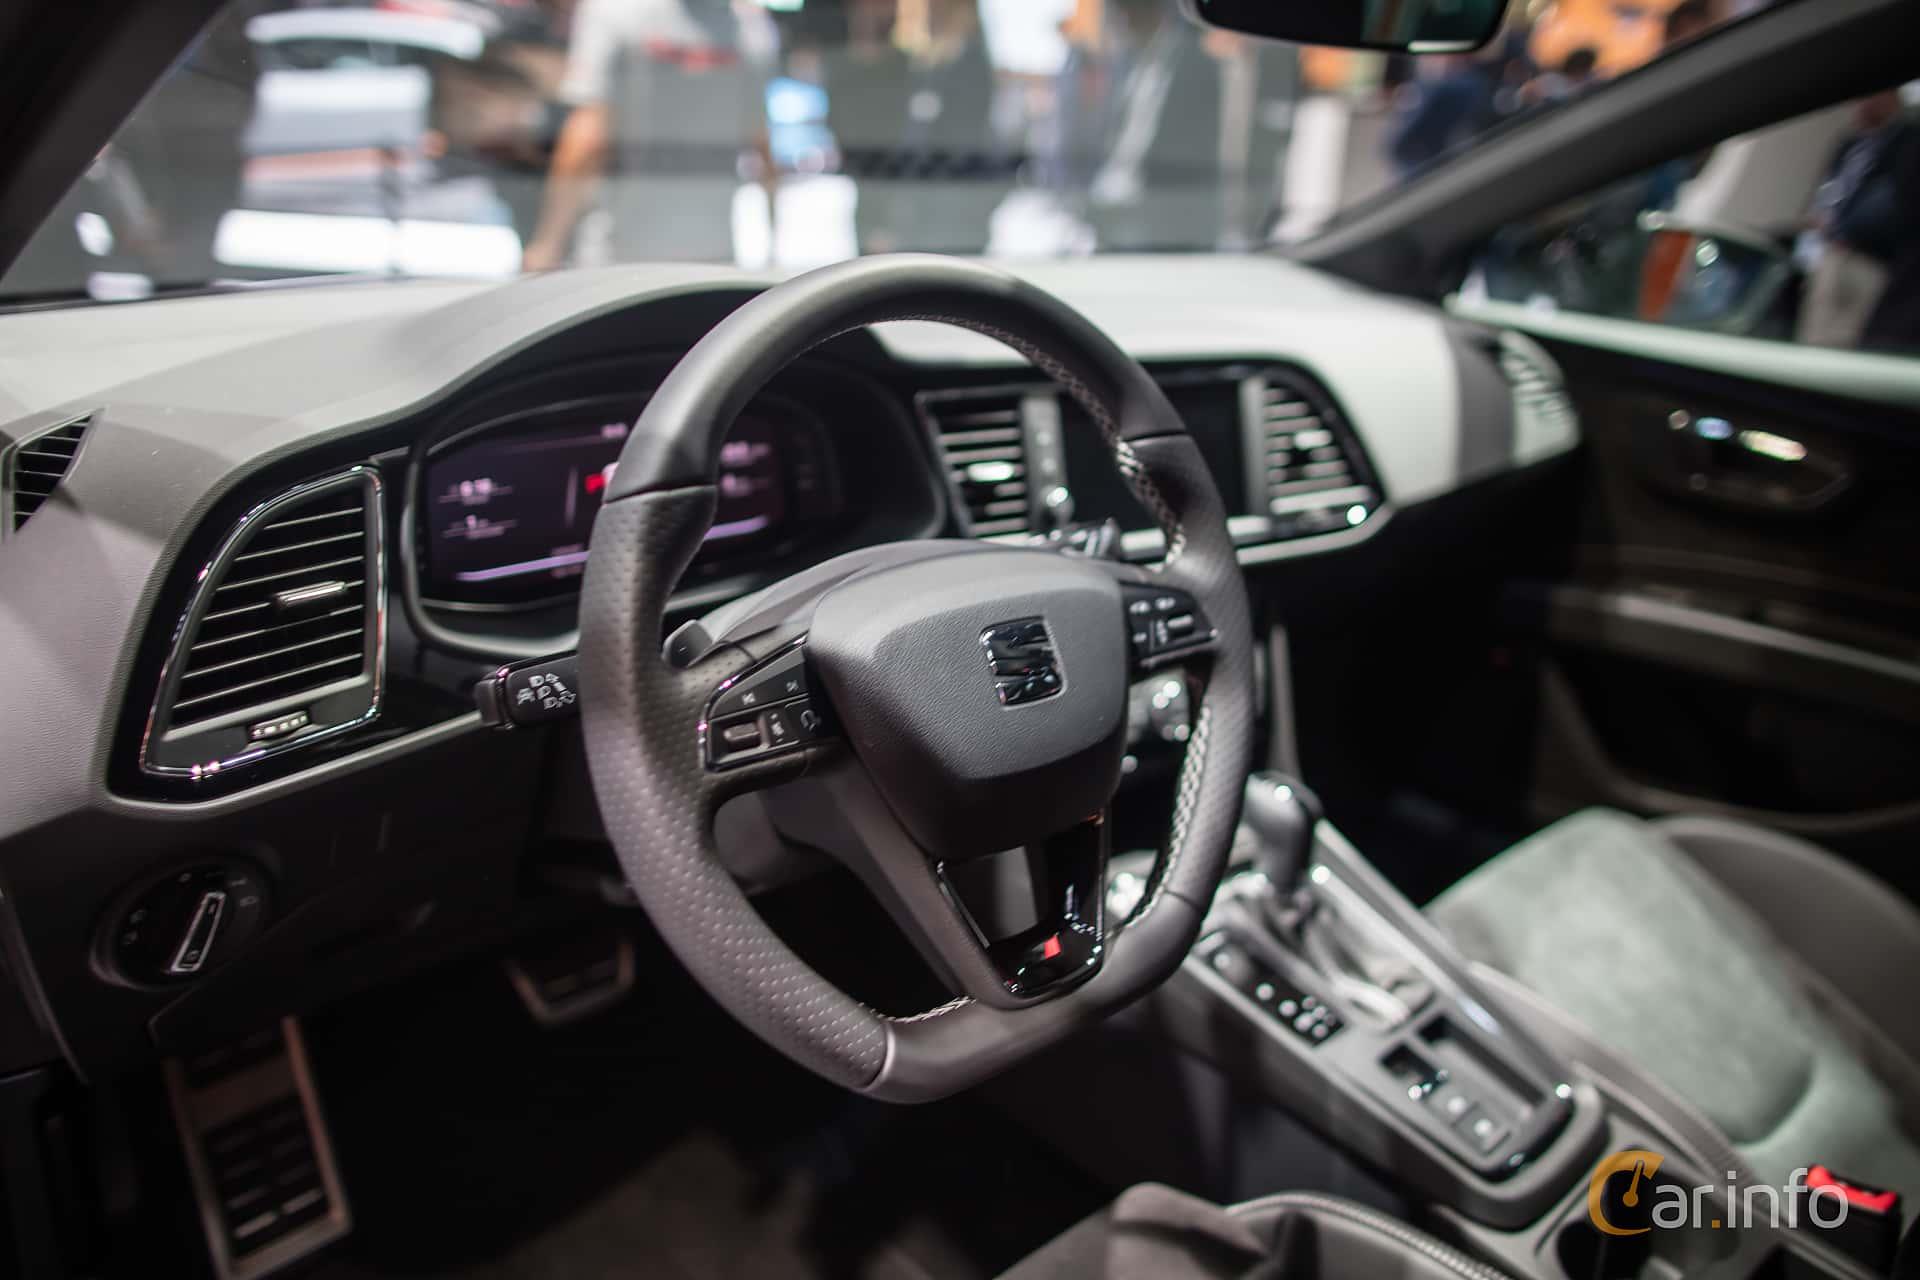 https://s.car.info/image_files/1920/seat-leon-st-interior-iaa-2017-2-452188.jpg